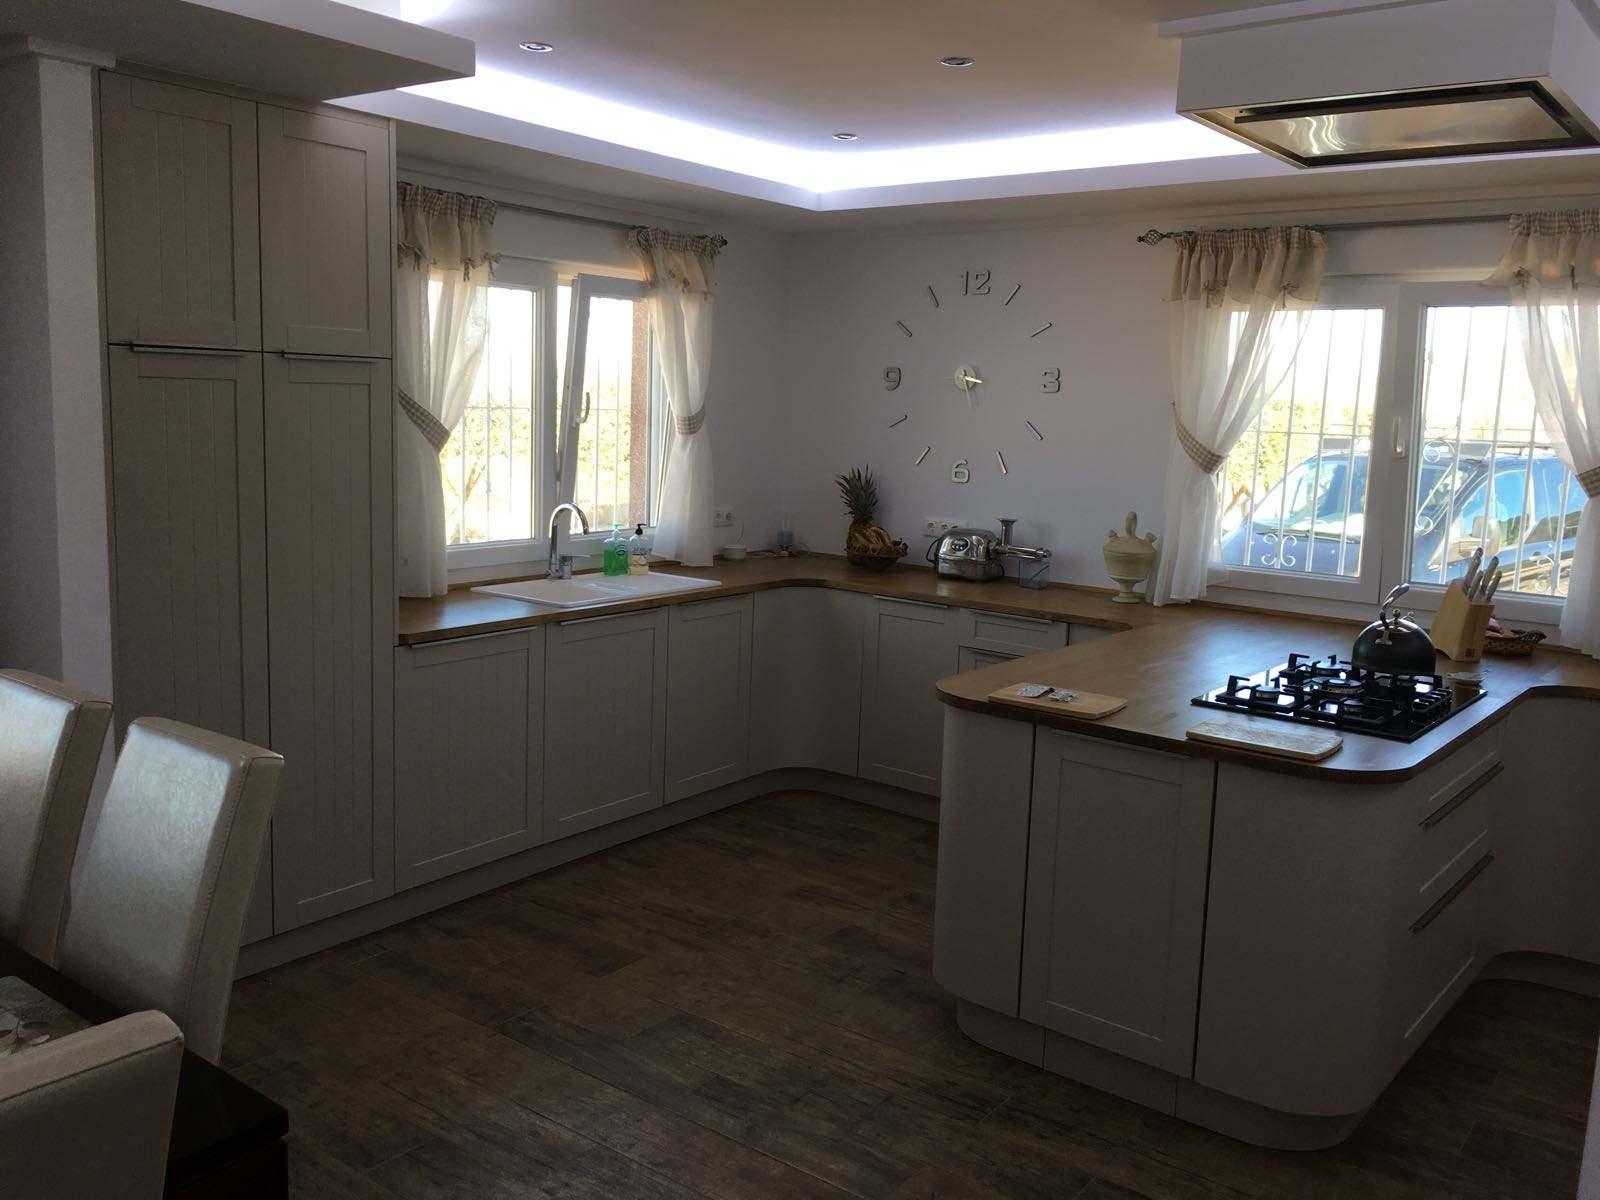 full-kitchen-renovation-leddy-contractors-9